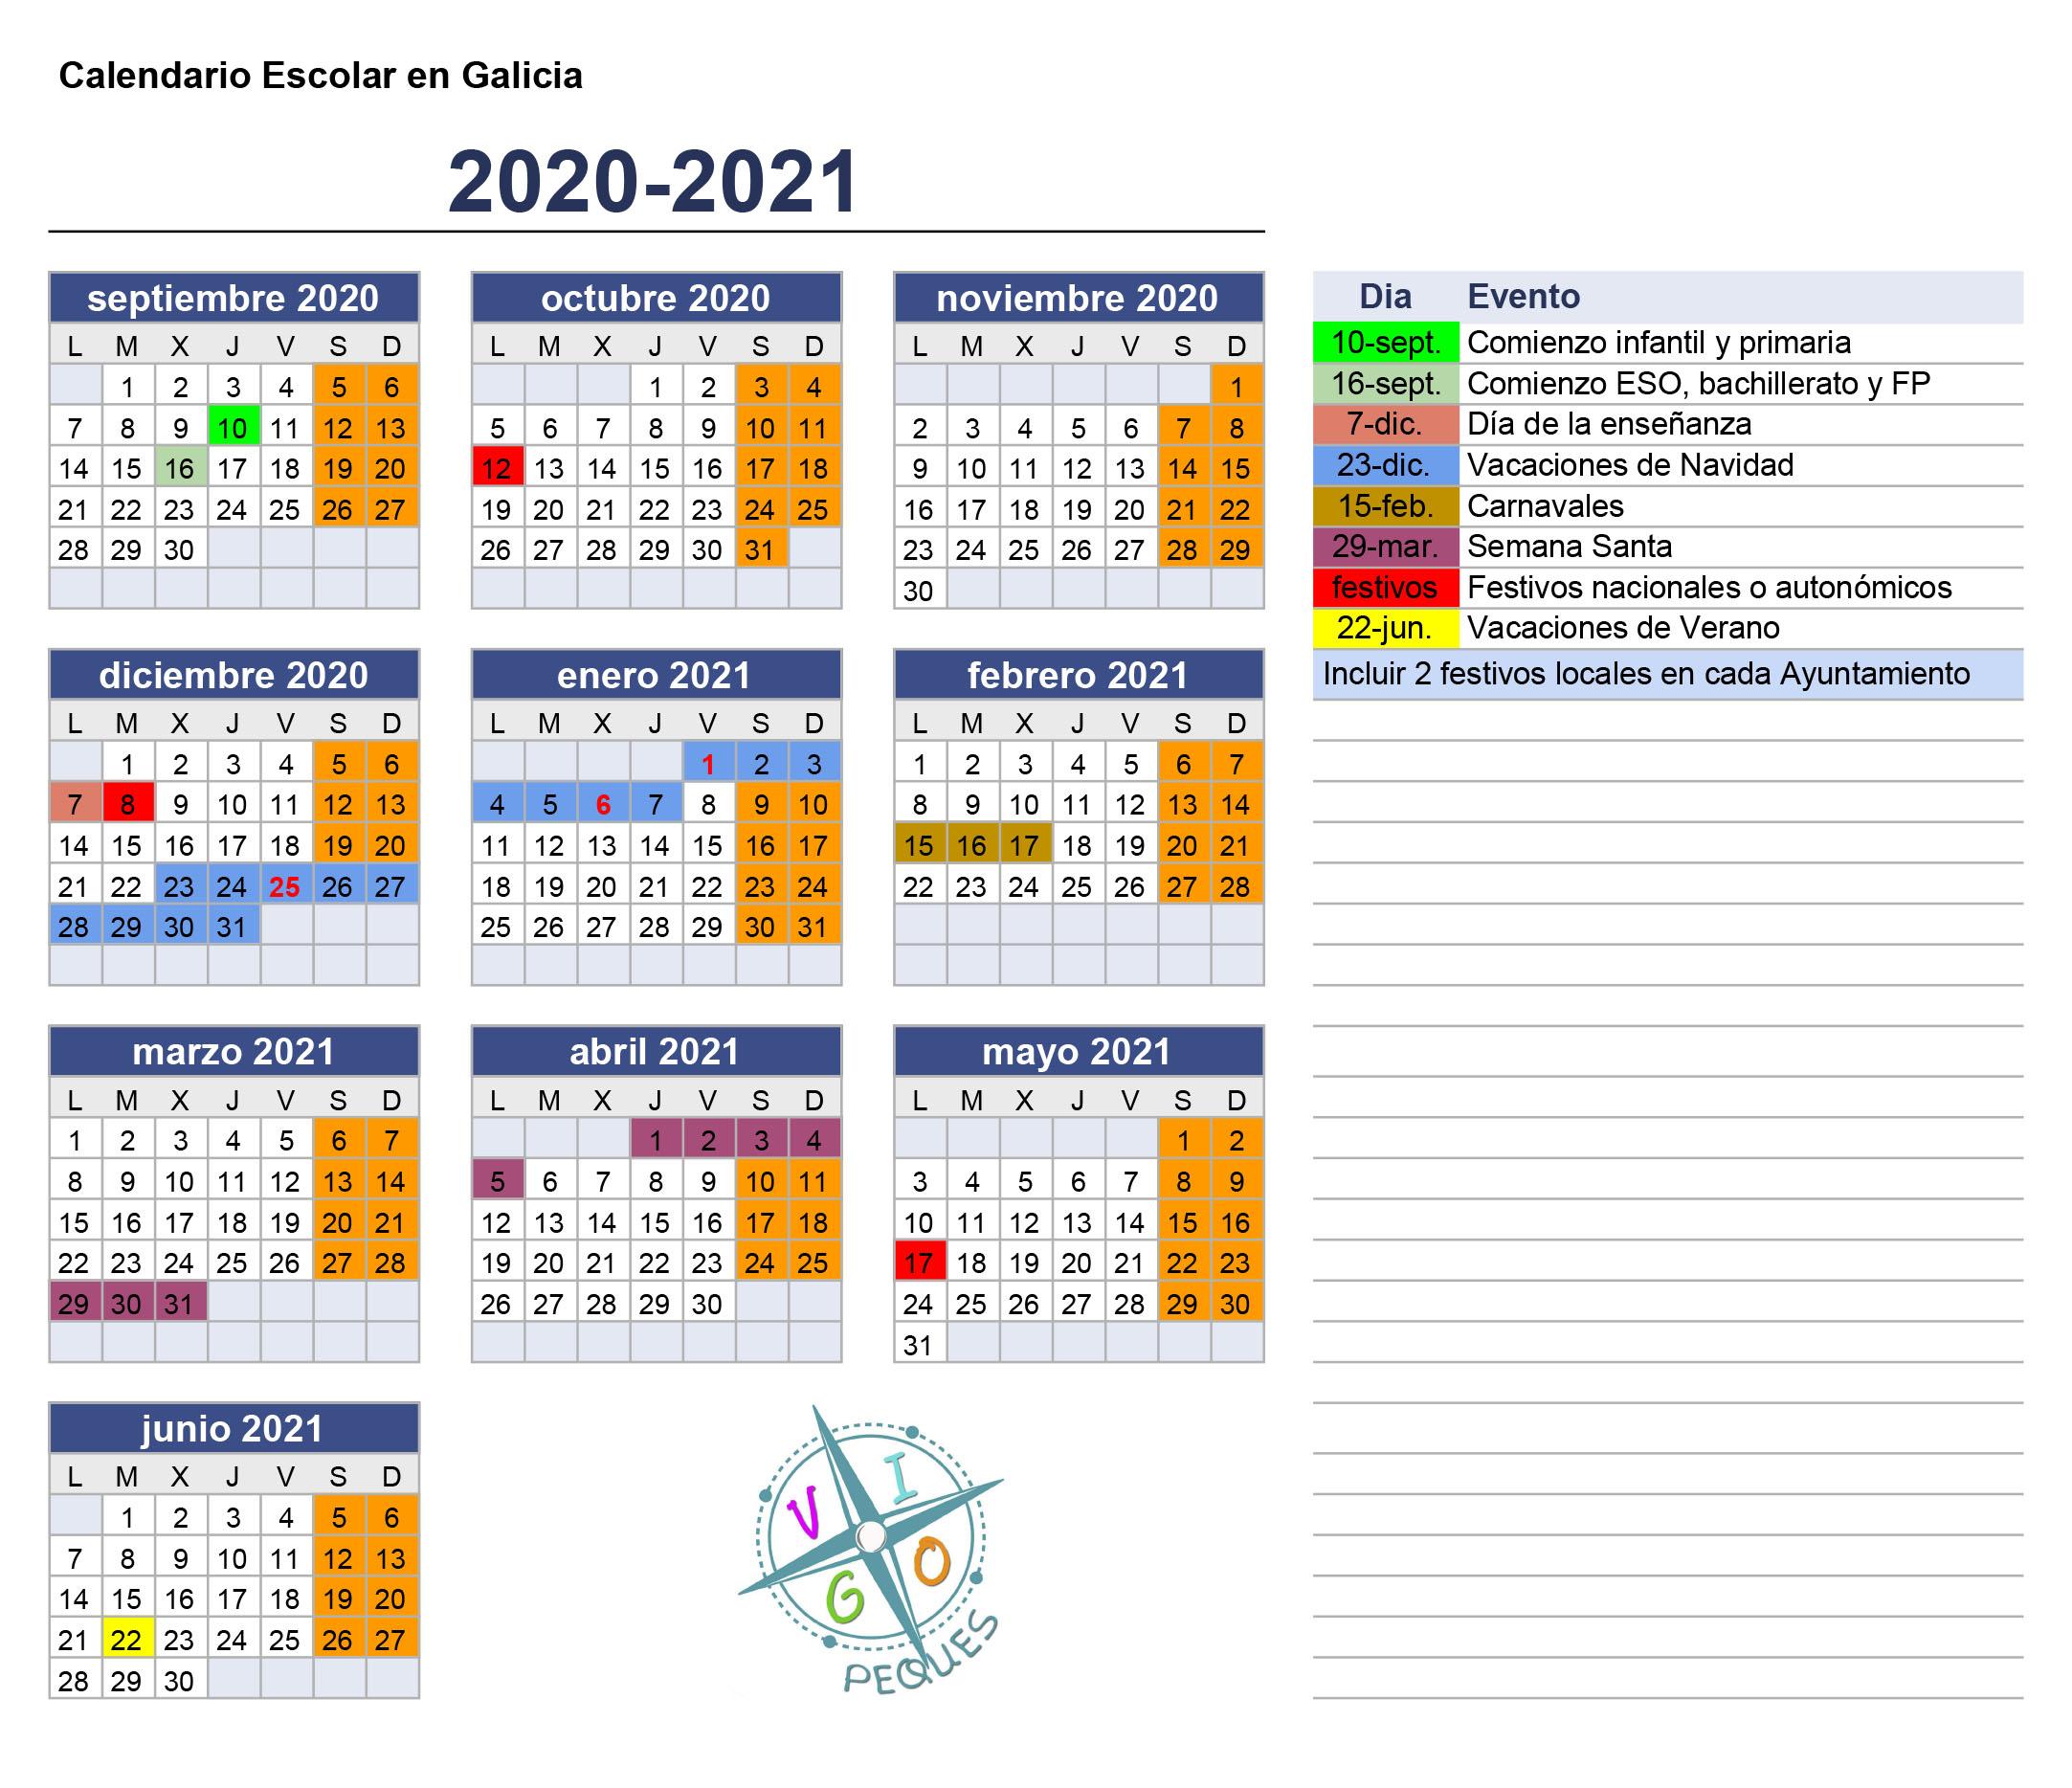 Calendario Escolar De Galicia 2020 21 Vigopeques